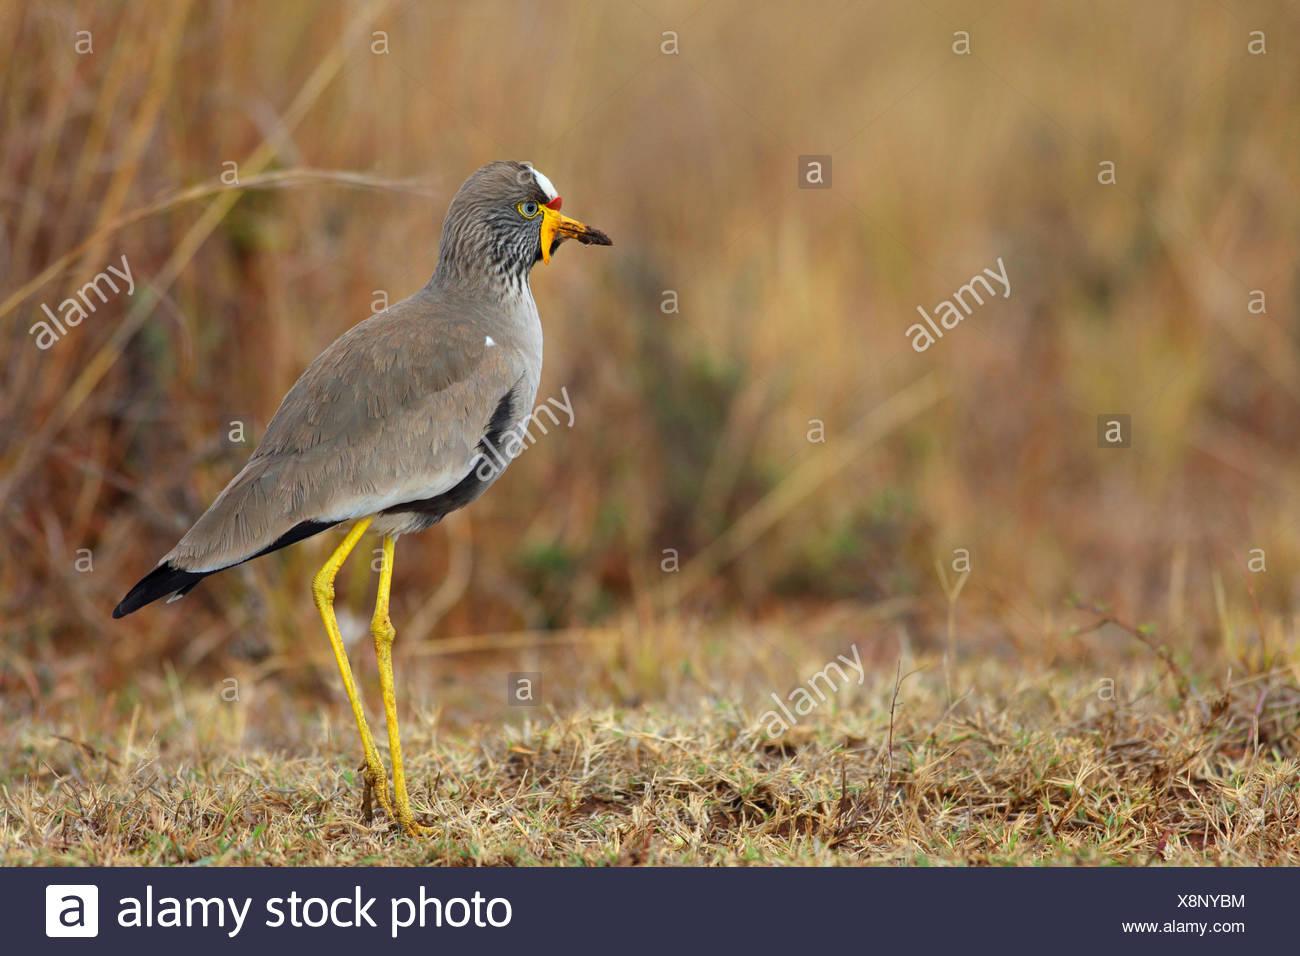 Senegal wattled plover (Vanellus senegallus), in piedi sul suolo, Sud Africa, Ithala Game Reserve Immagini Stock